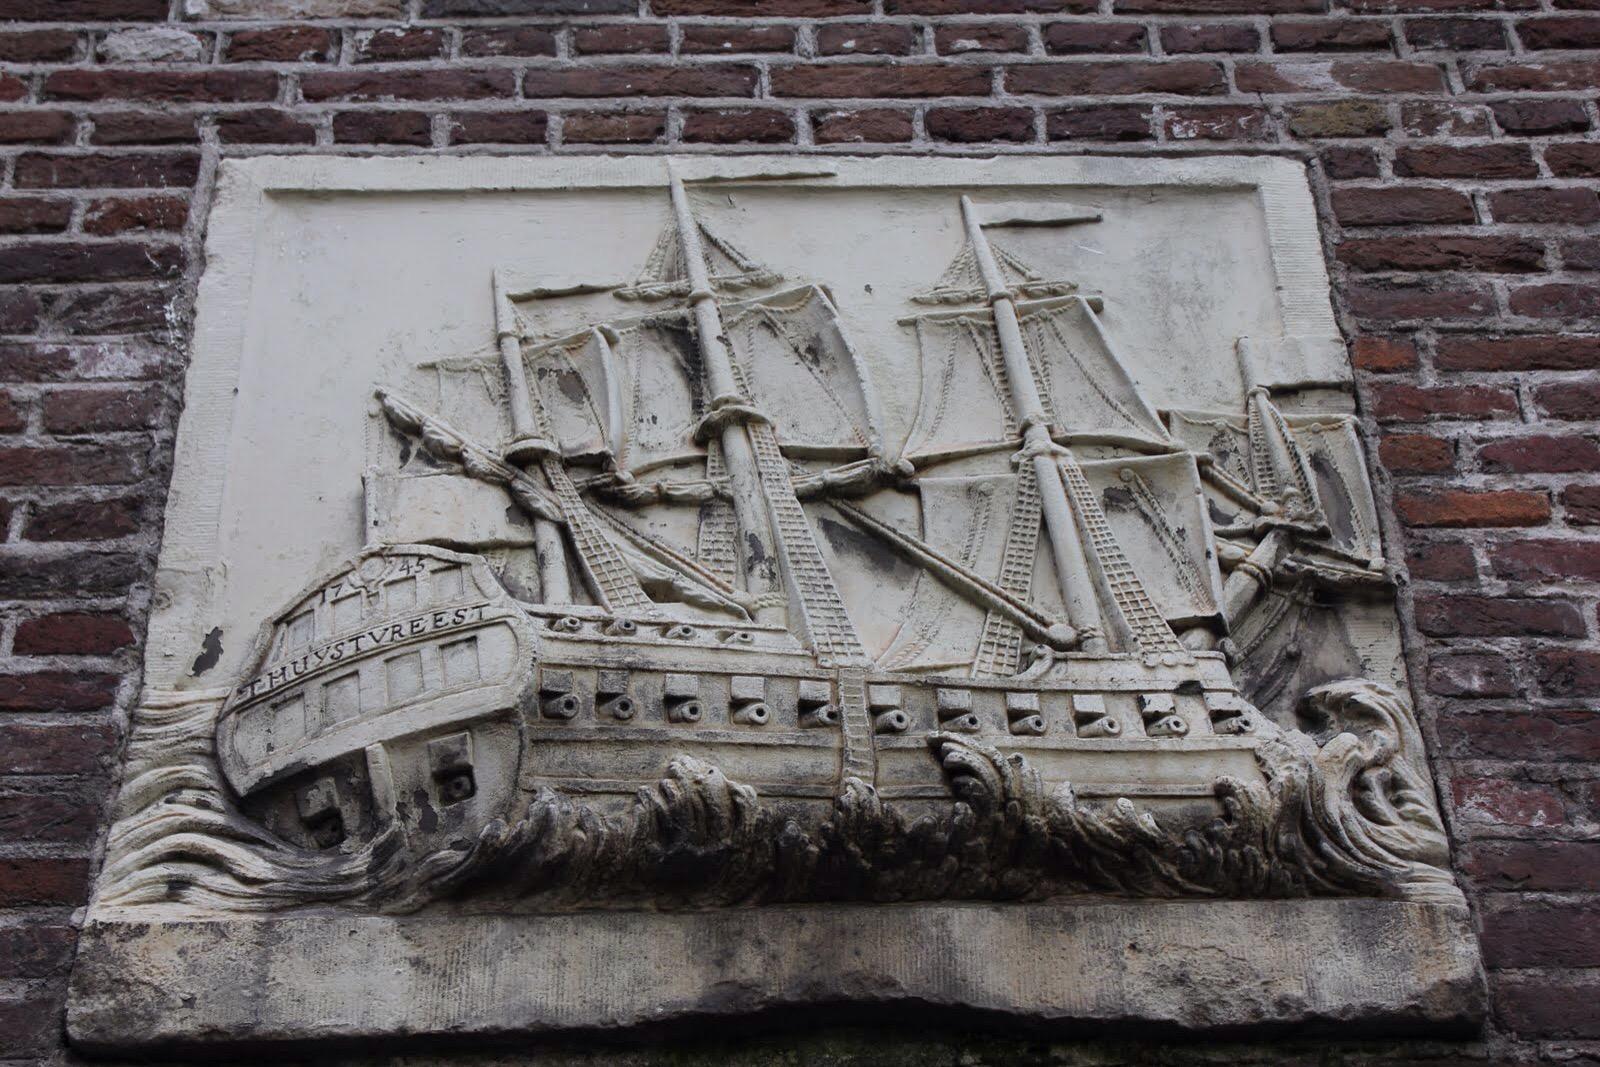 Thuystvreest amsterdam